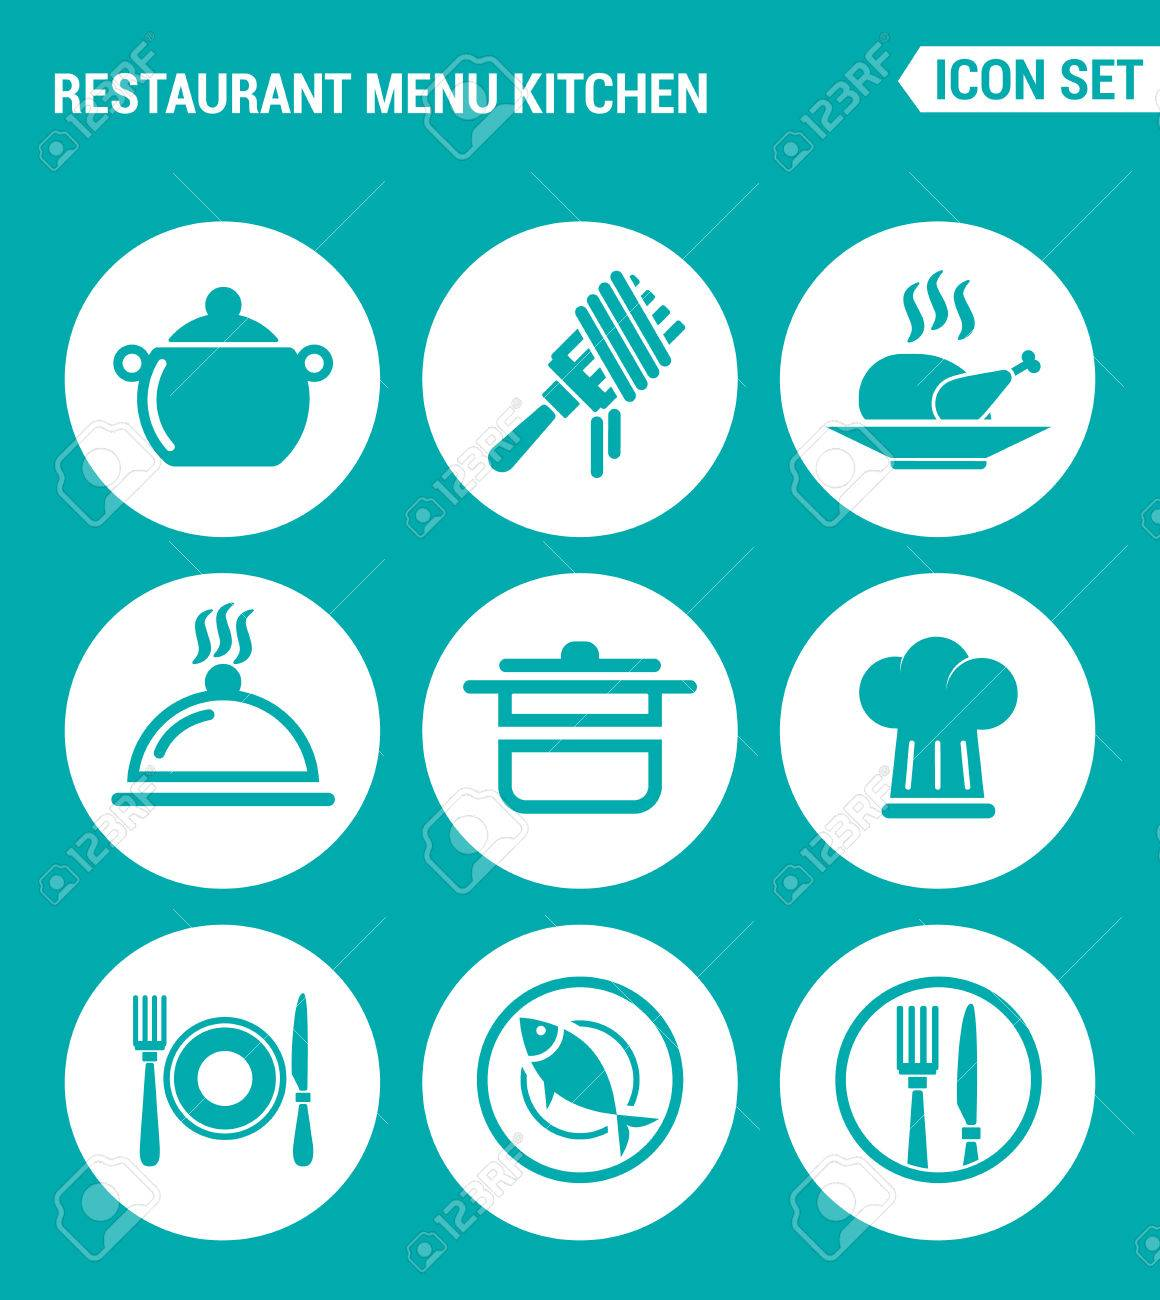 Vektor-Set Web-Icons. Restaurant Menü-Küche, Gabel, Huhn, Schüssel ...